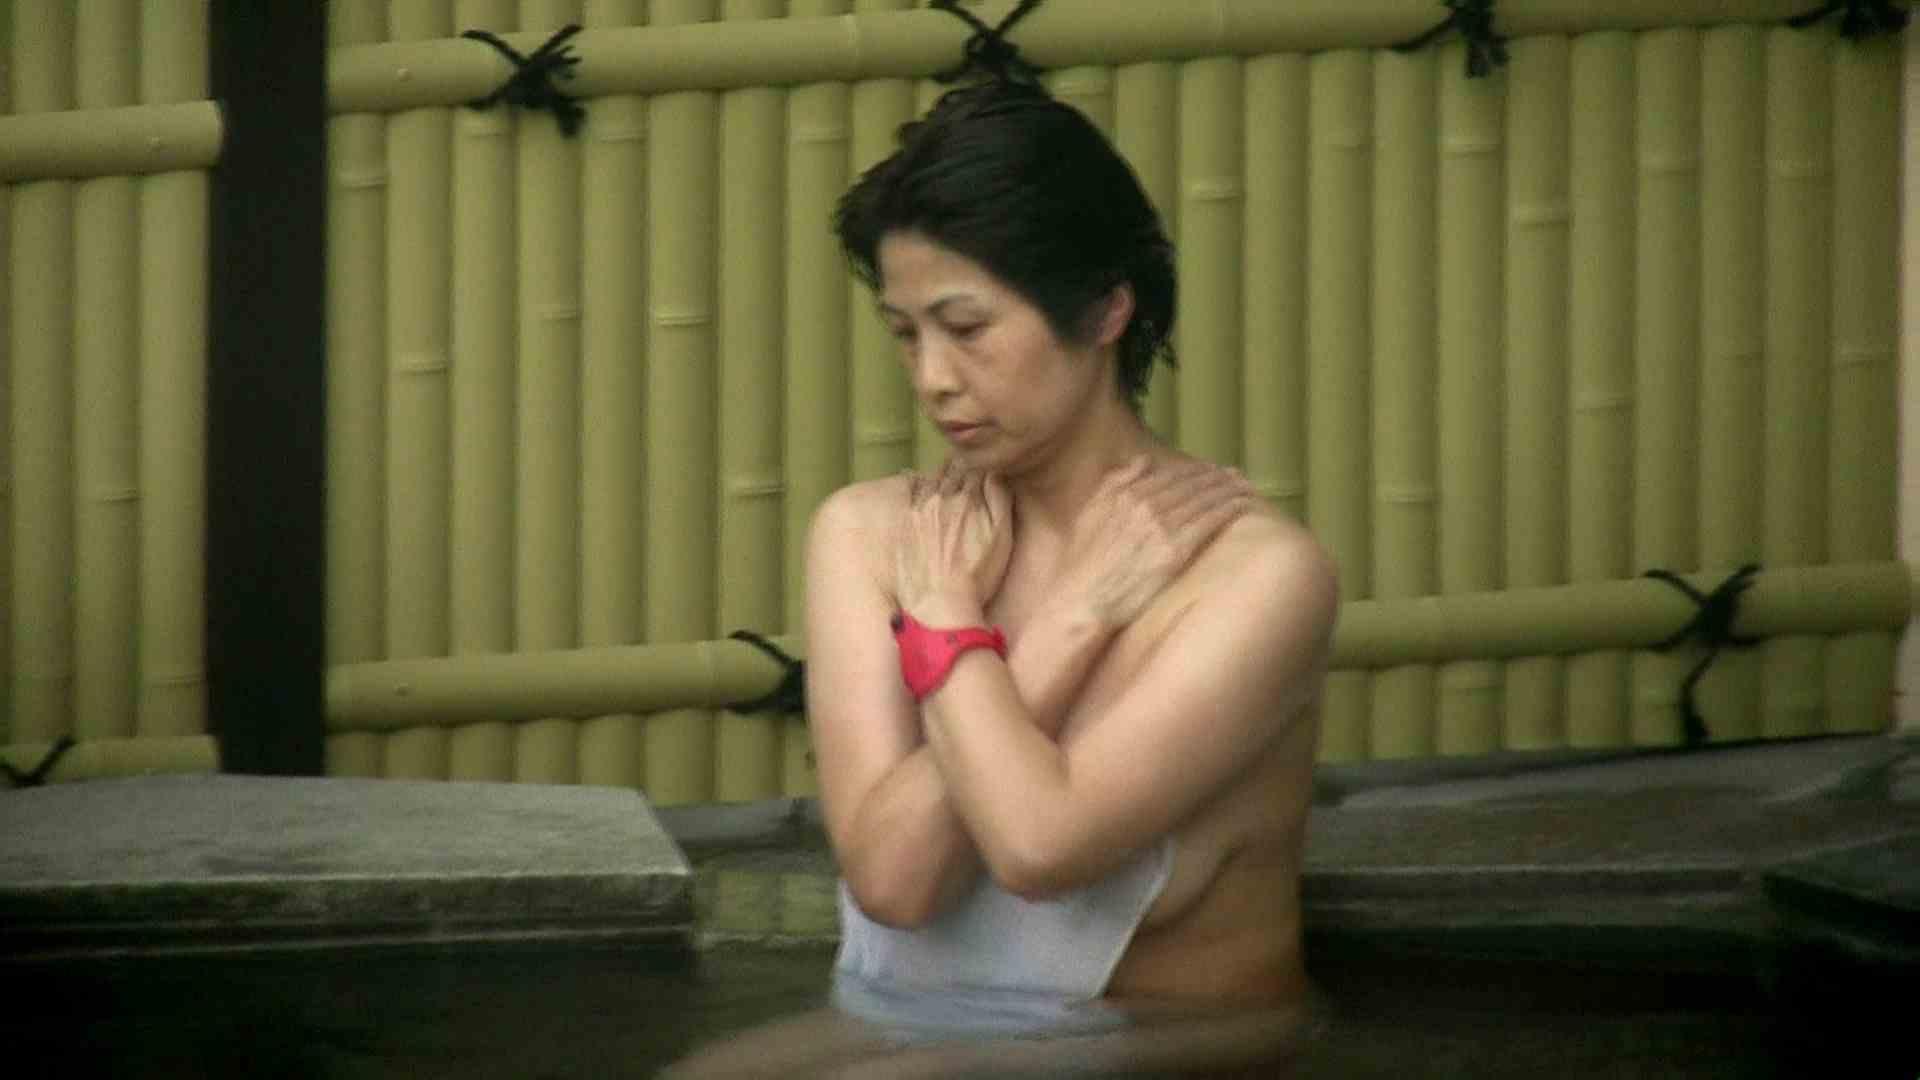 Aquaな露天風呂Vol.636 HなOL | 盗撮  82pic 32